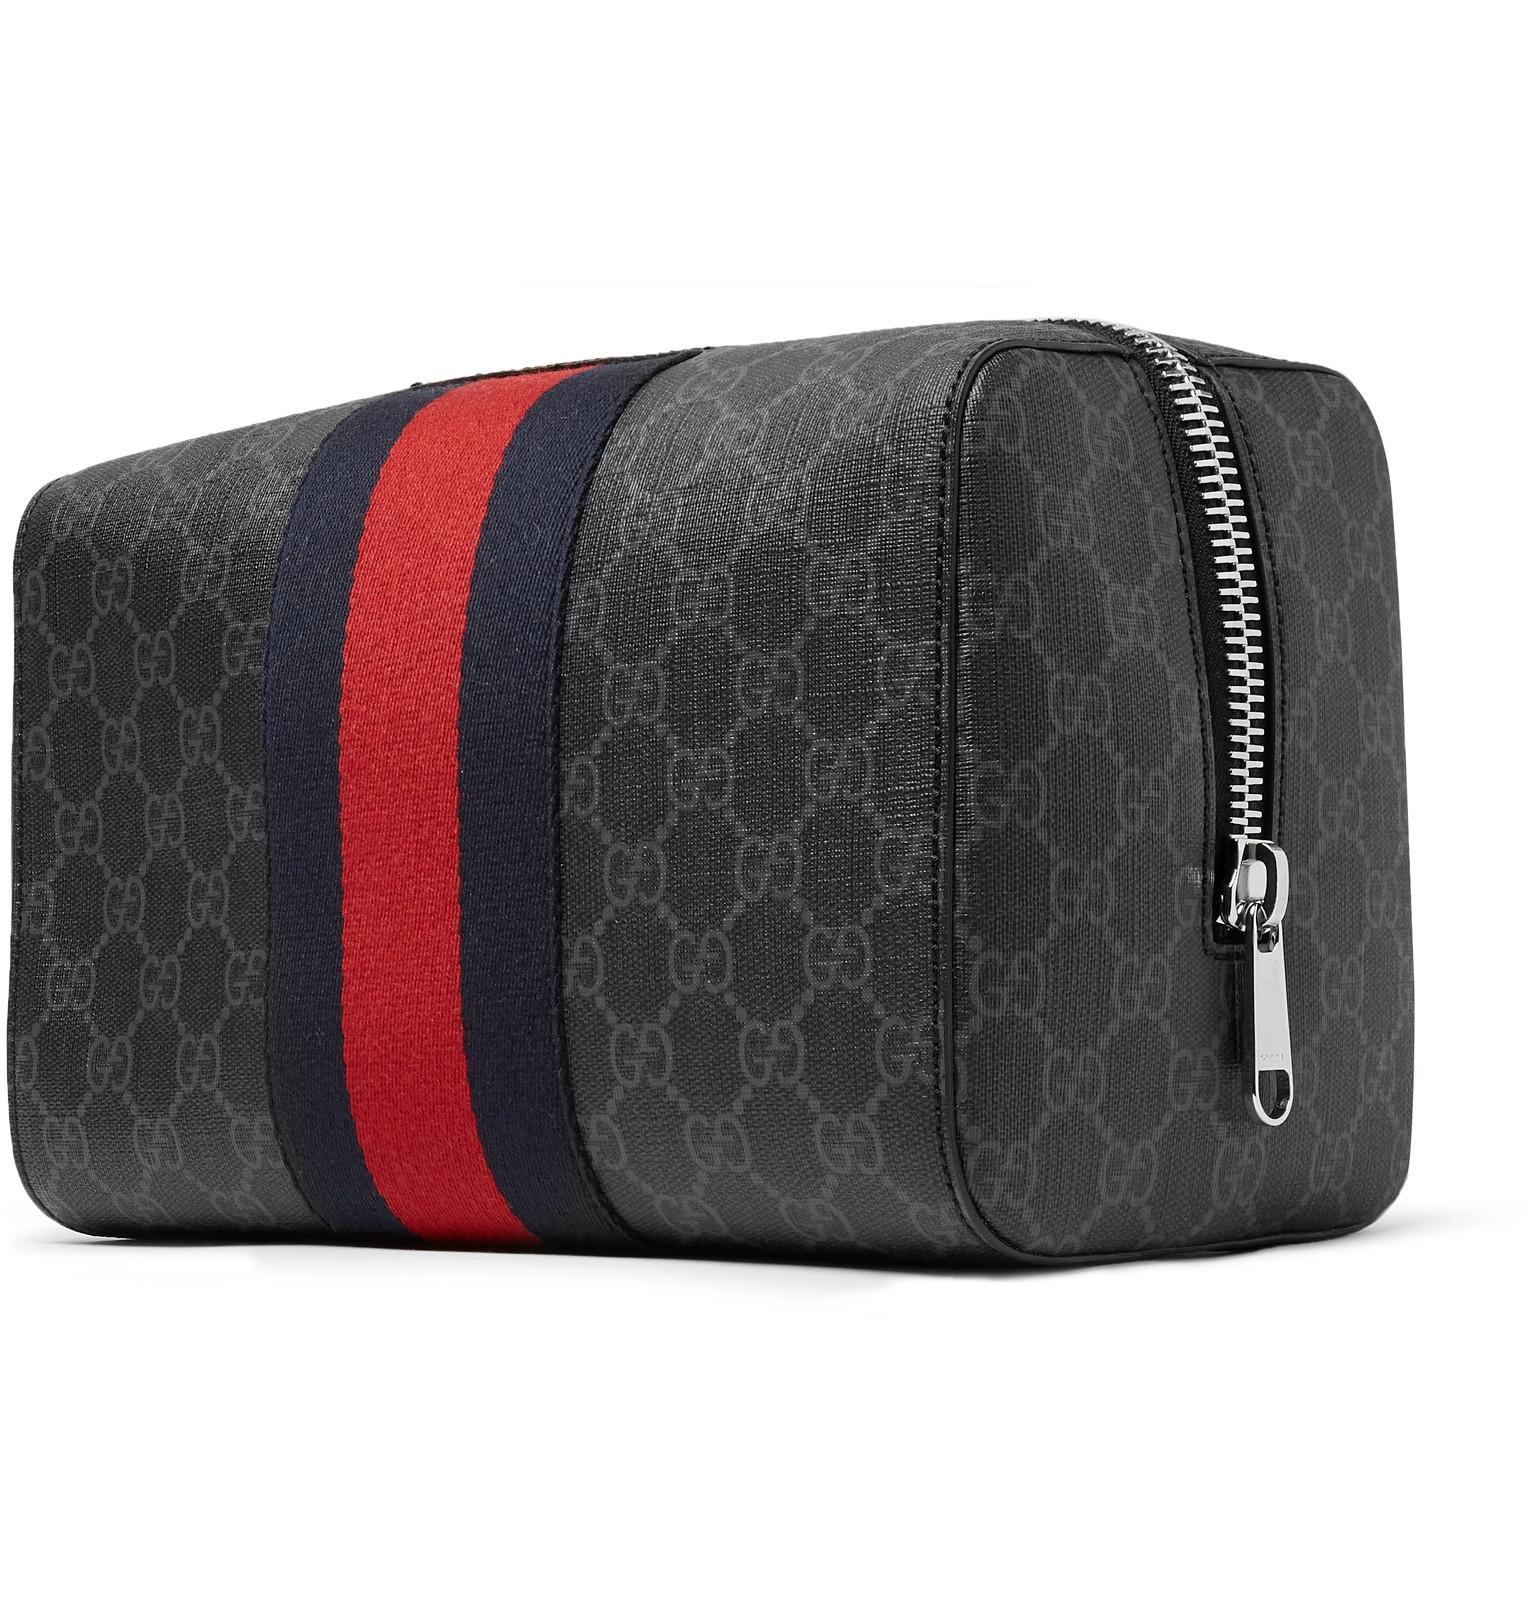 f856c0e062c8 Gucci - Black Monogrammed Coated-canvas Wash Bag for Men - Lyst. View  fullscreen